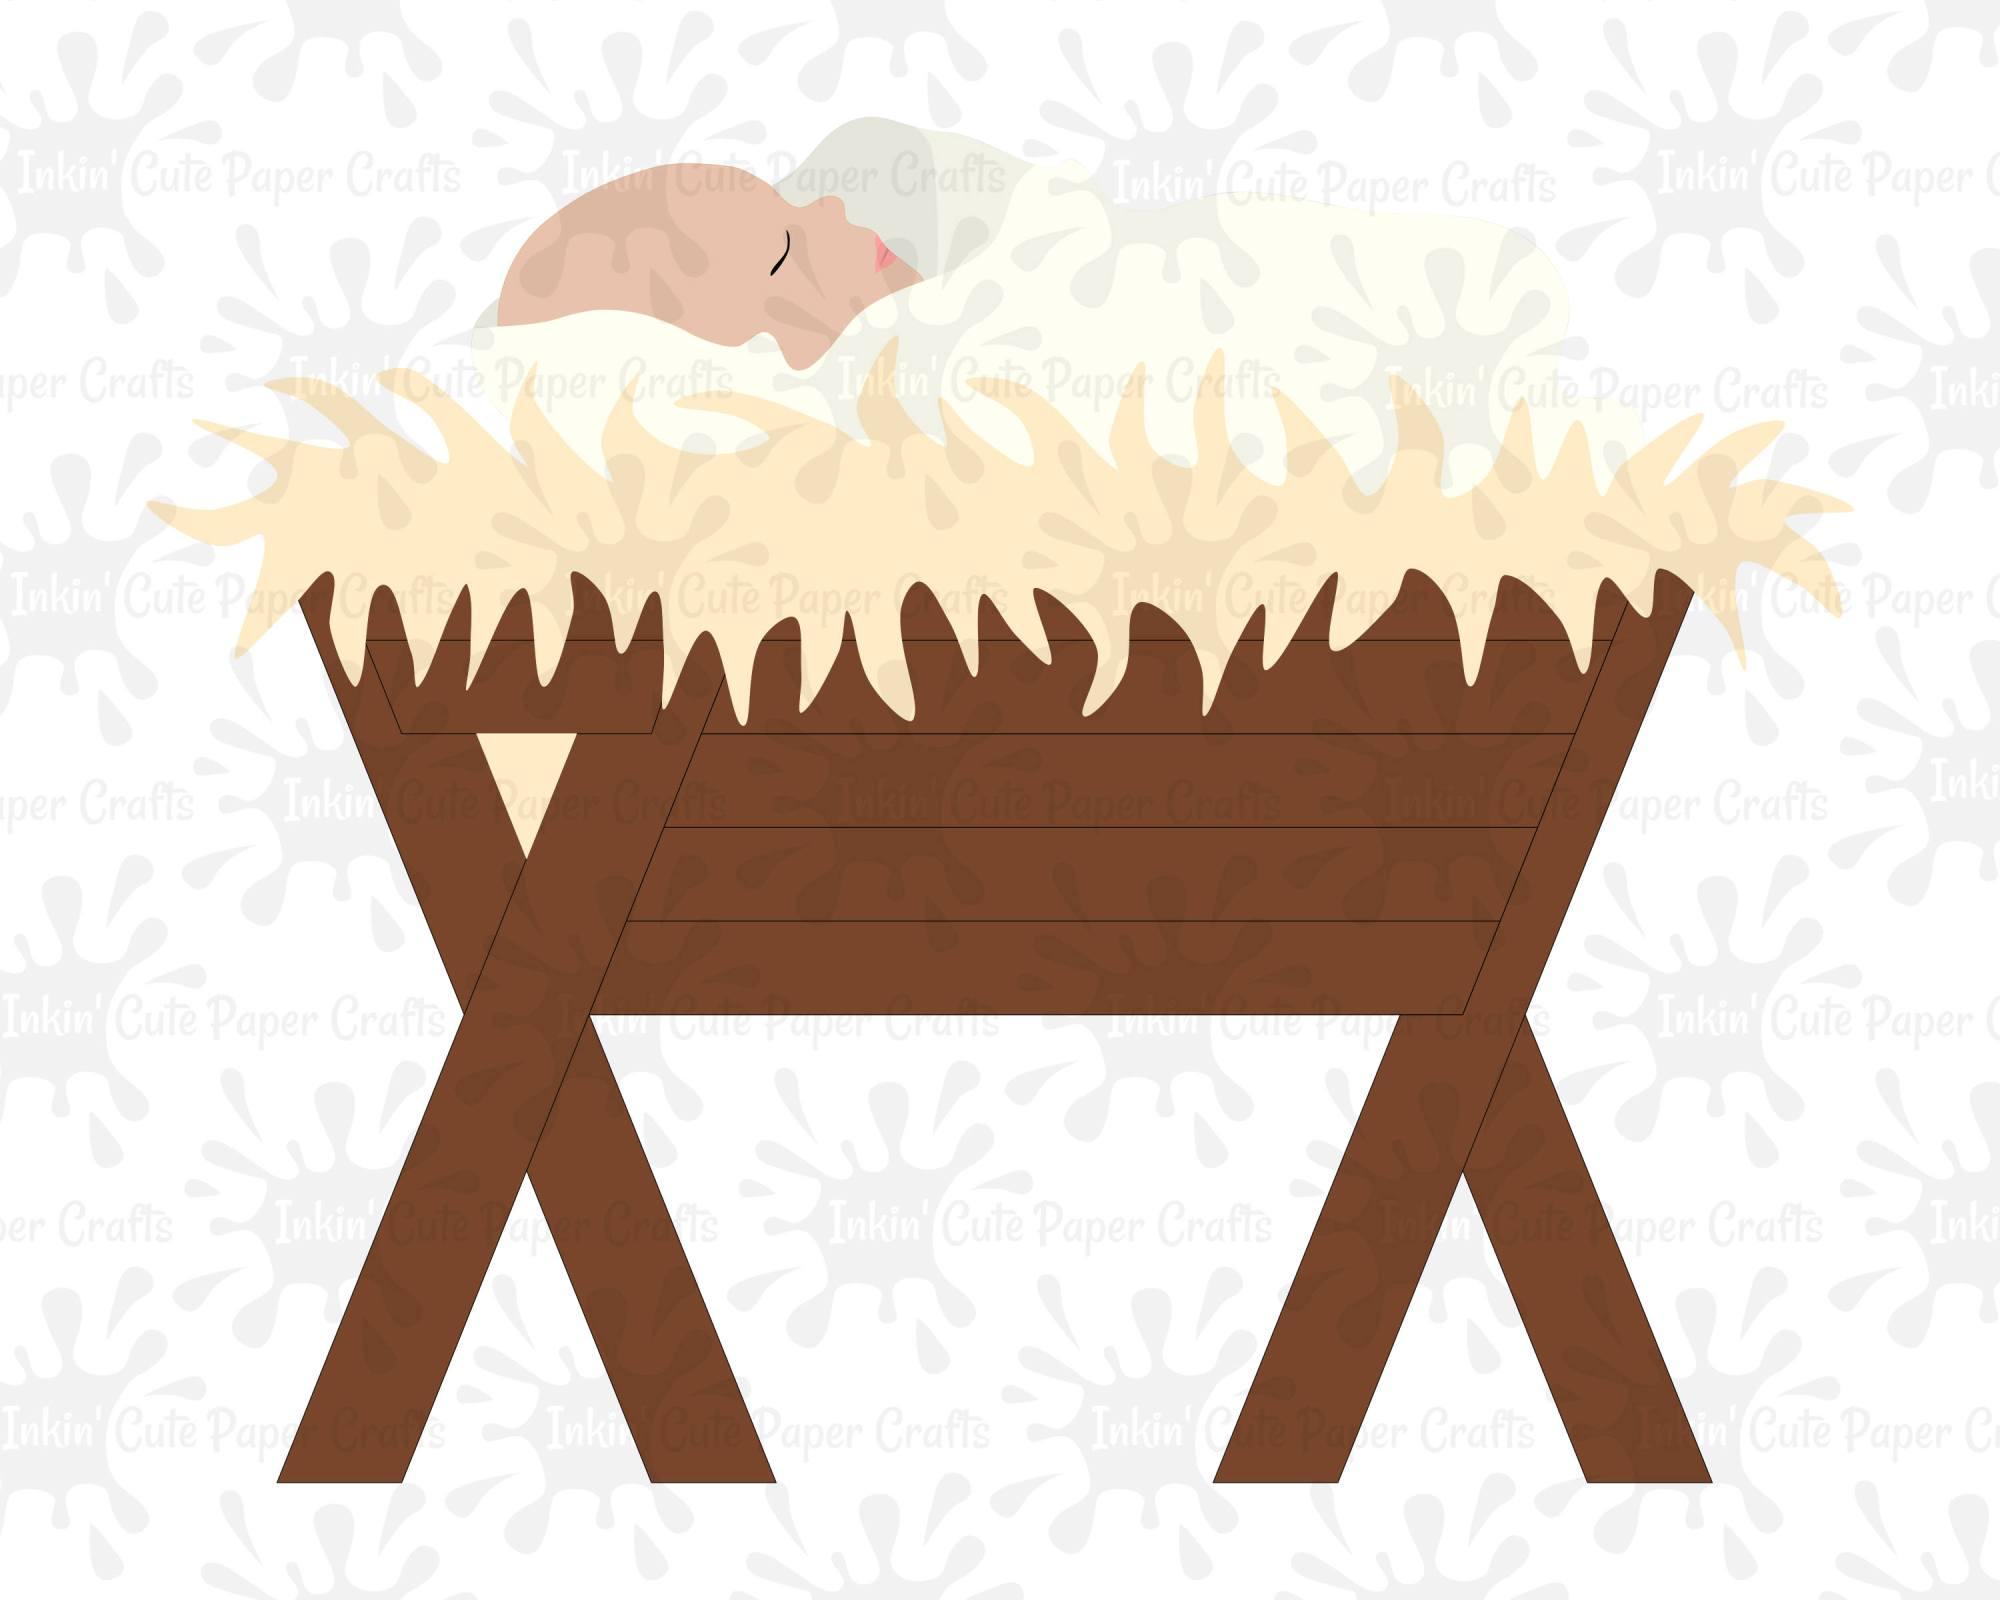 hight resolution of 3000x2400 nativity svg bible clipart nativity scene svg file manger scene